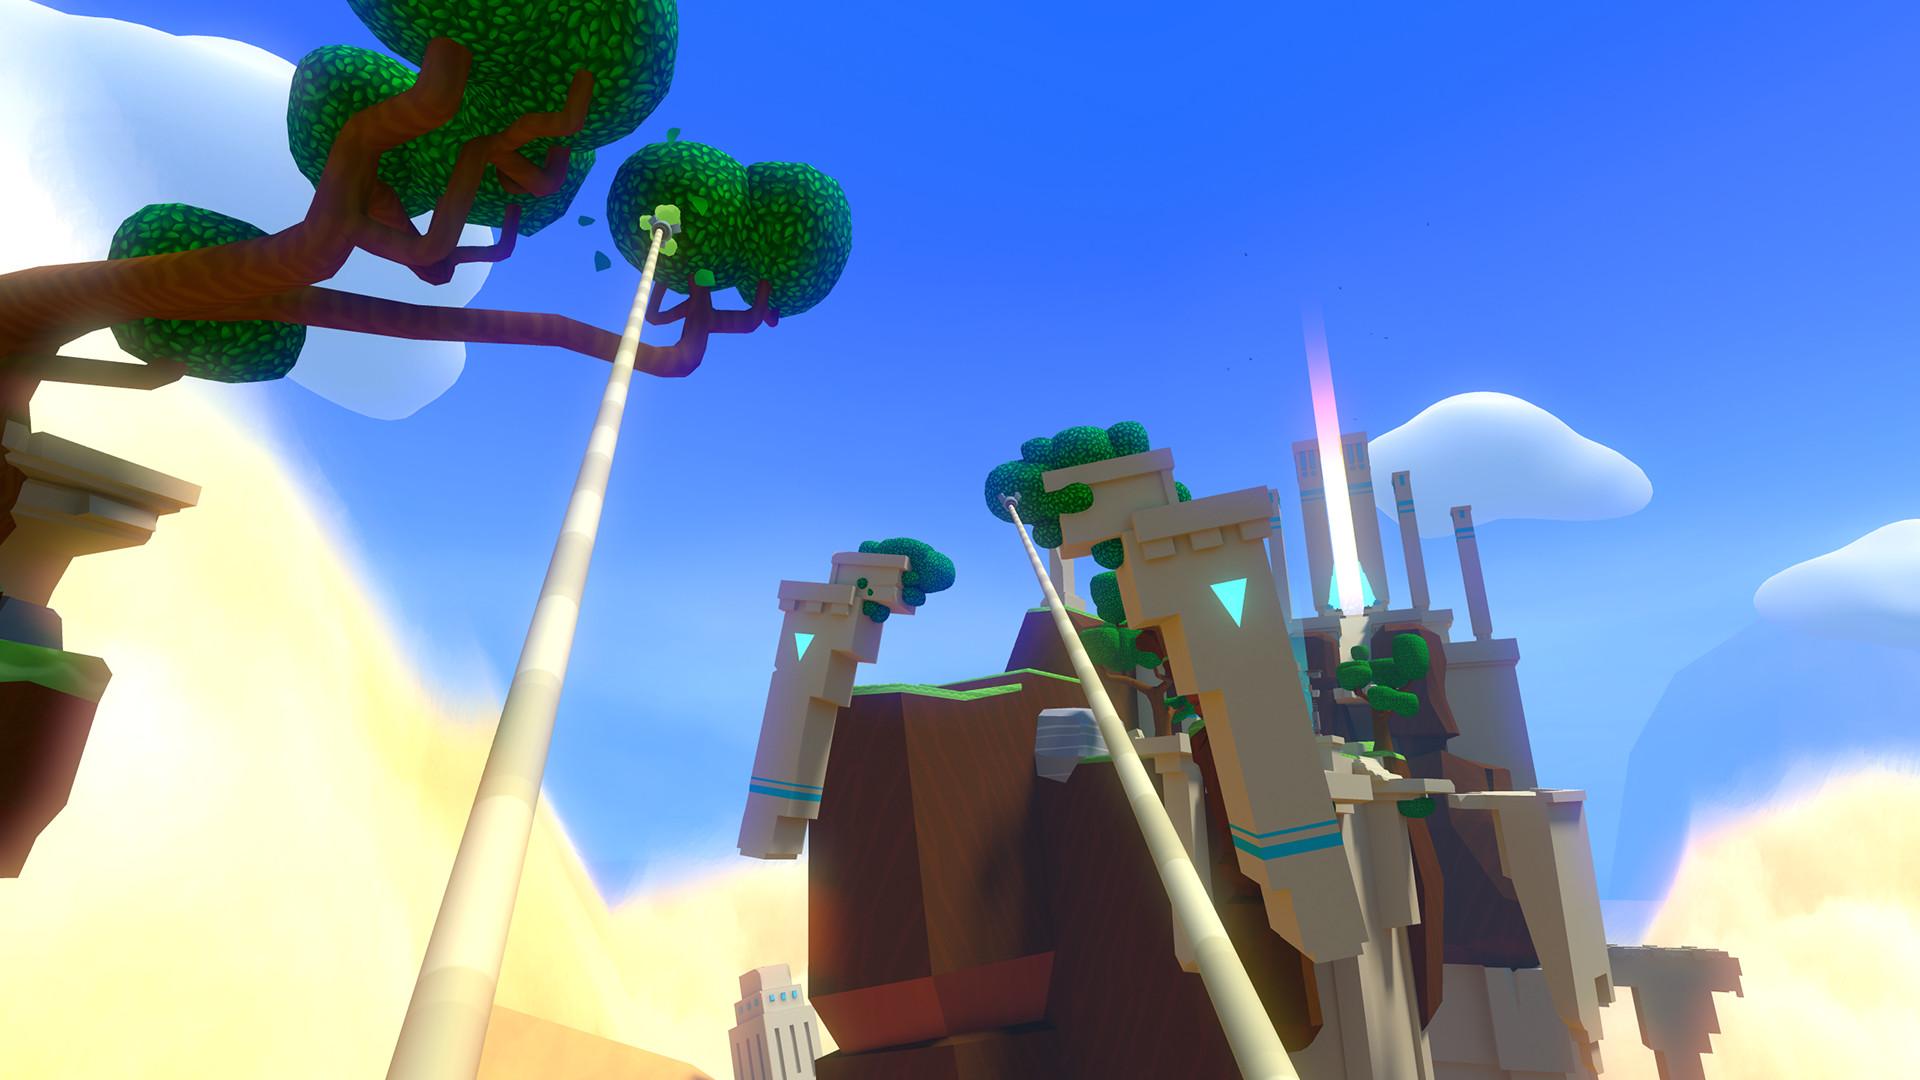 Oculus Quest 游戏《Windlands VR》御风飞行插图